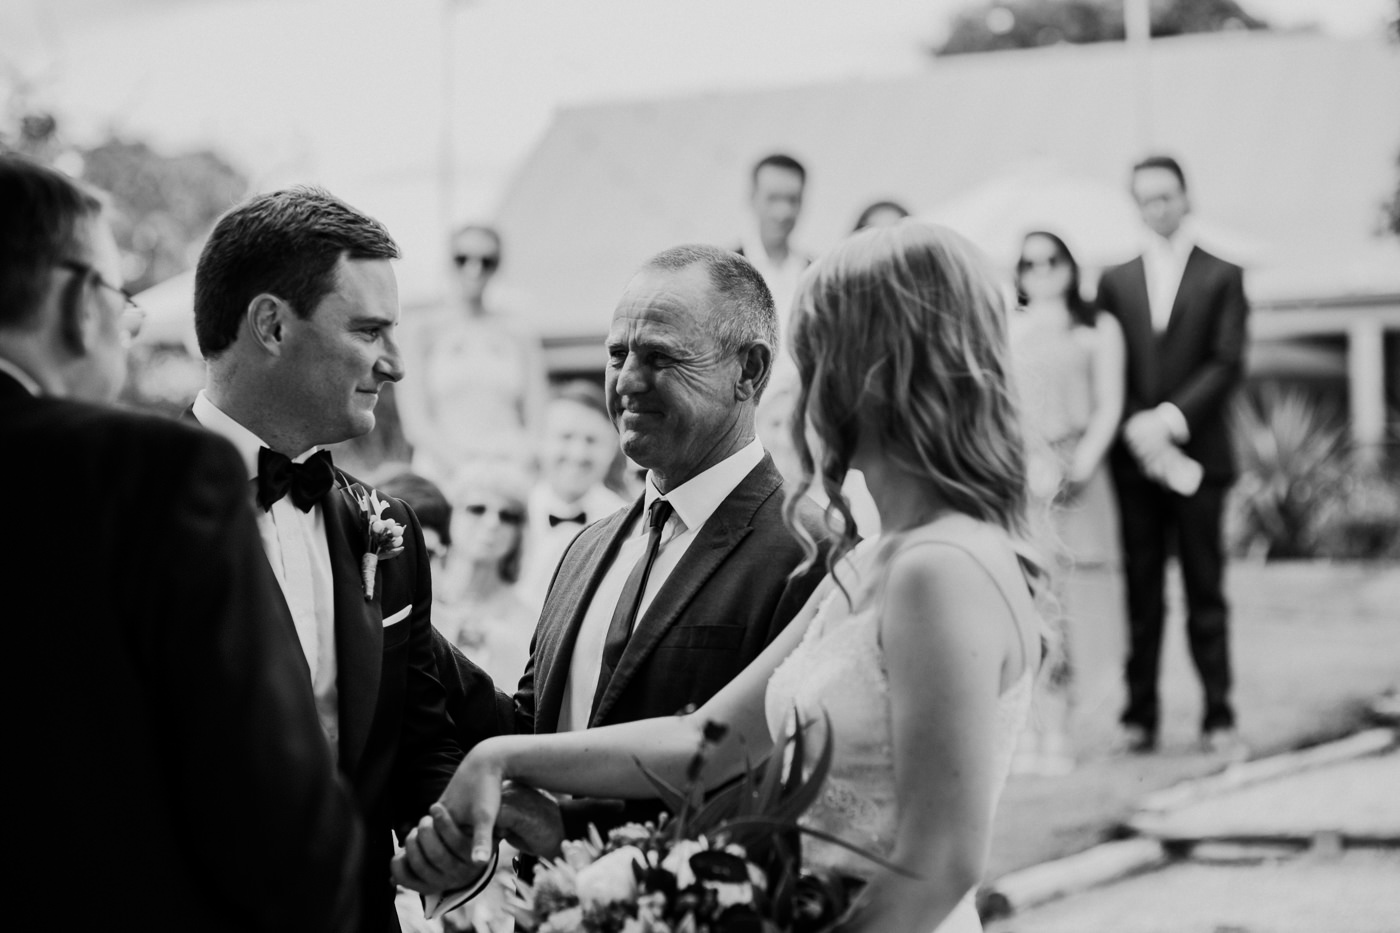 Anthony & Eliet - Wagga Wagga Wedding - Country NSW - Samantha Heather Photography-100.jpg